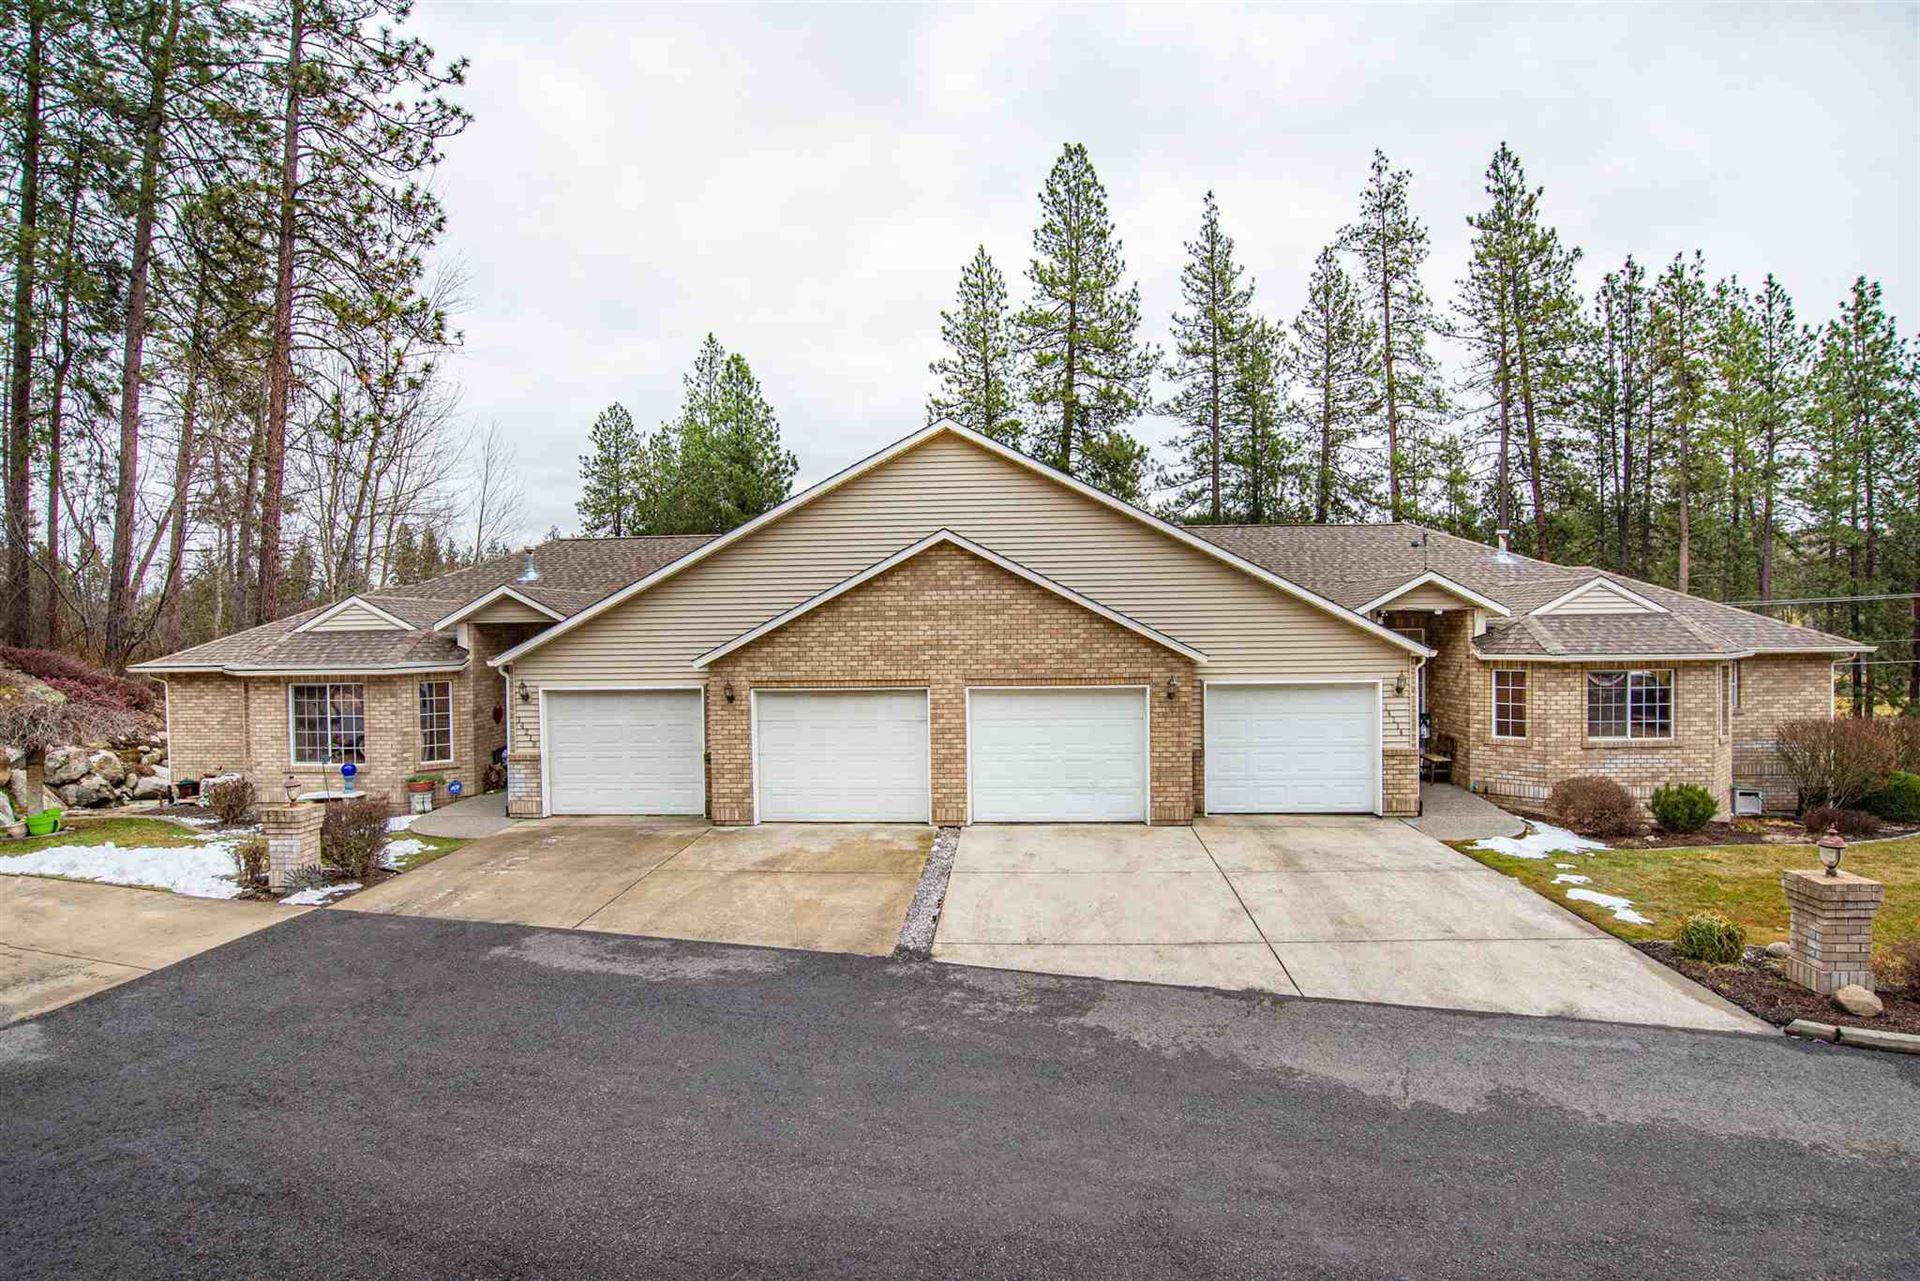 14214 N Wanderview Ln, Spokane, WA 99208-9618 - #: 202111824